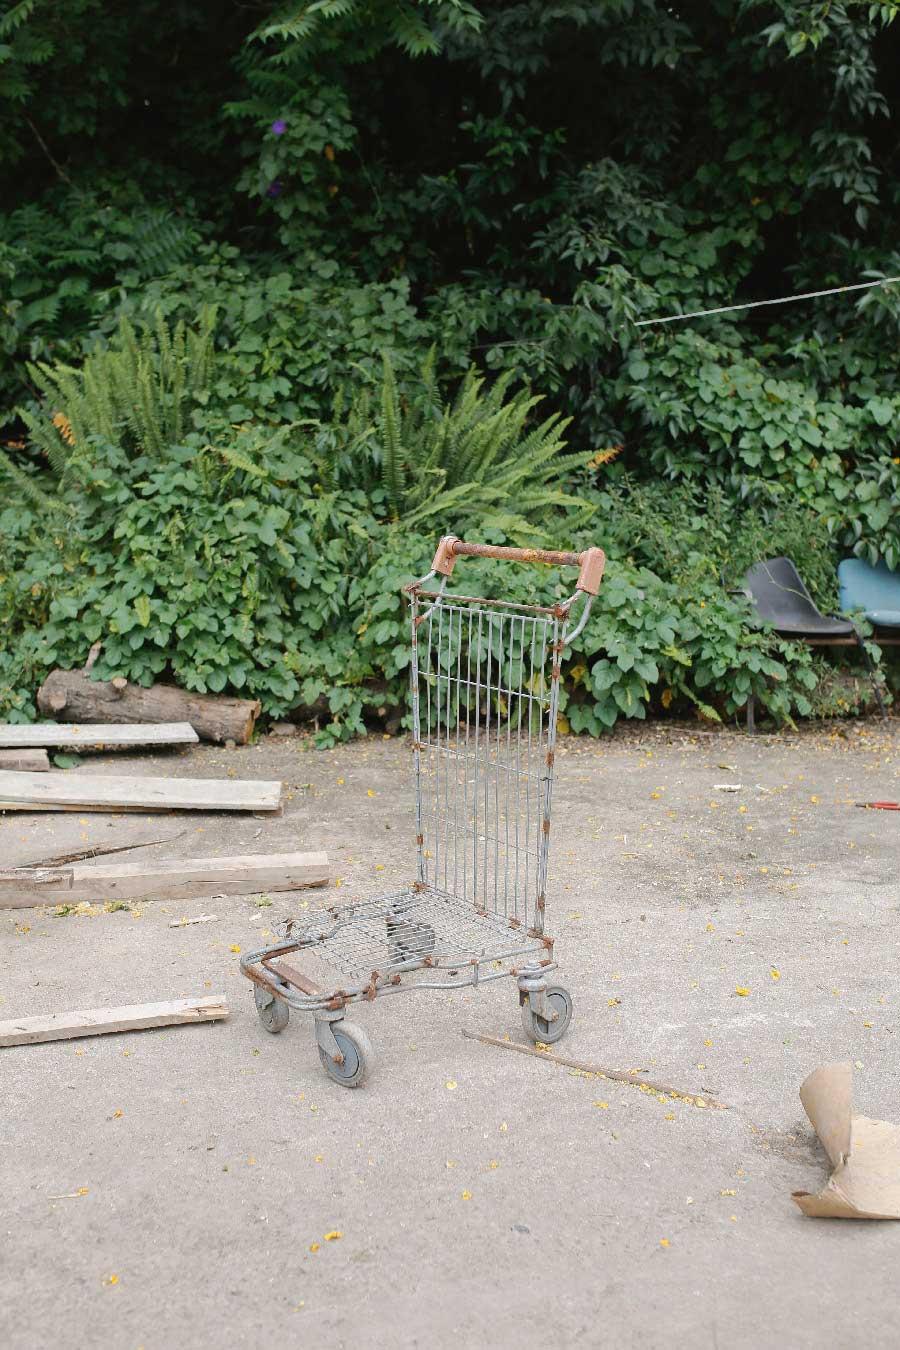 Cart from the series Turning Light by Jenni Emilia Toivonen